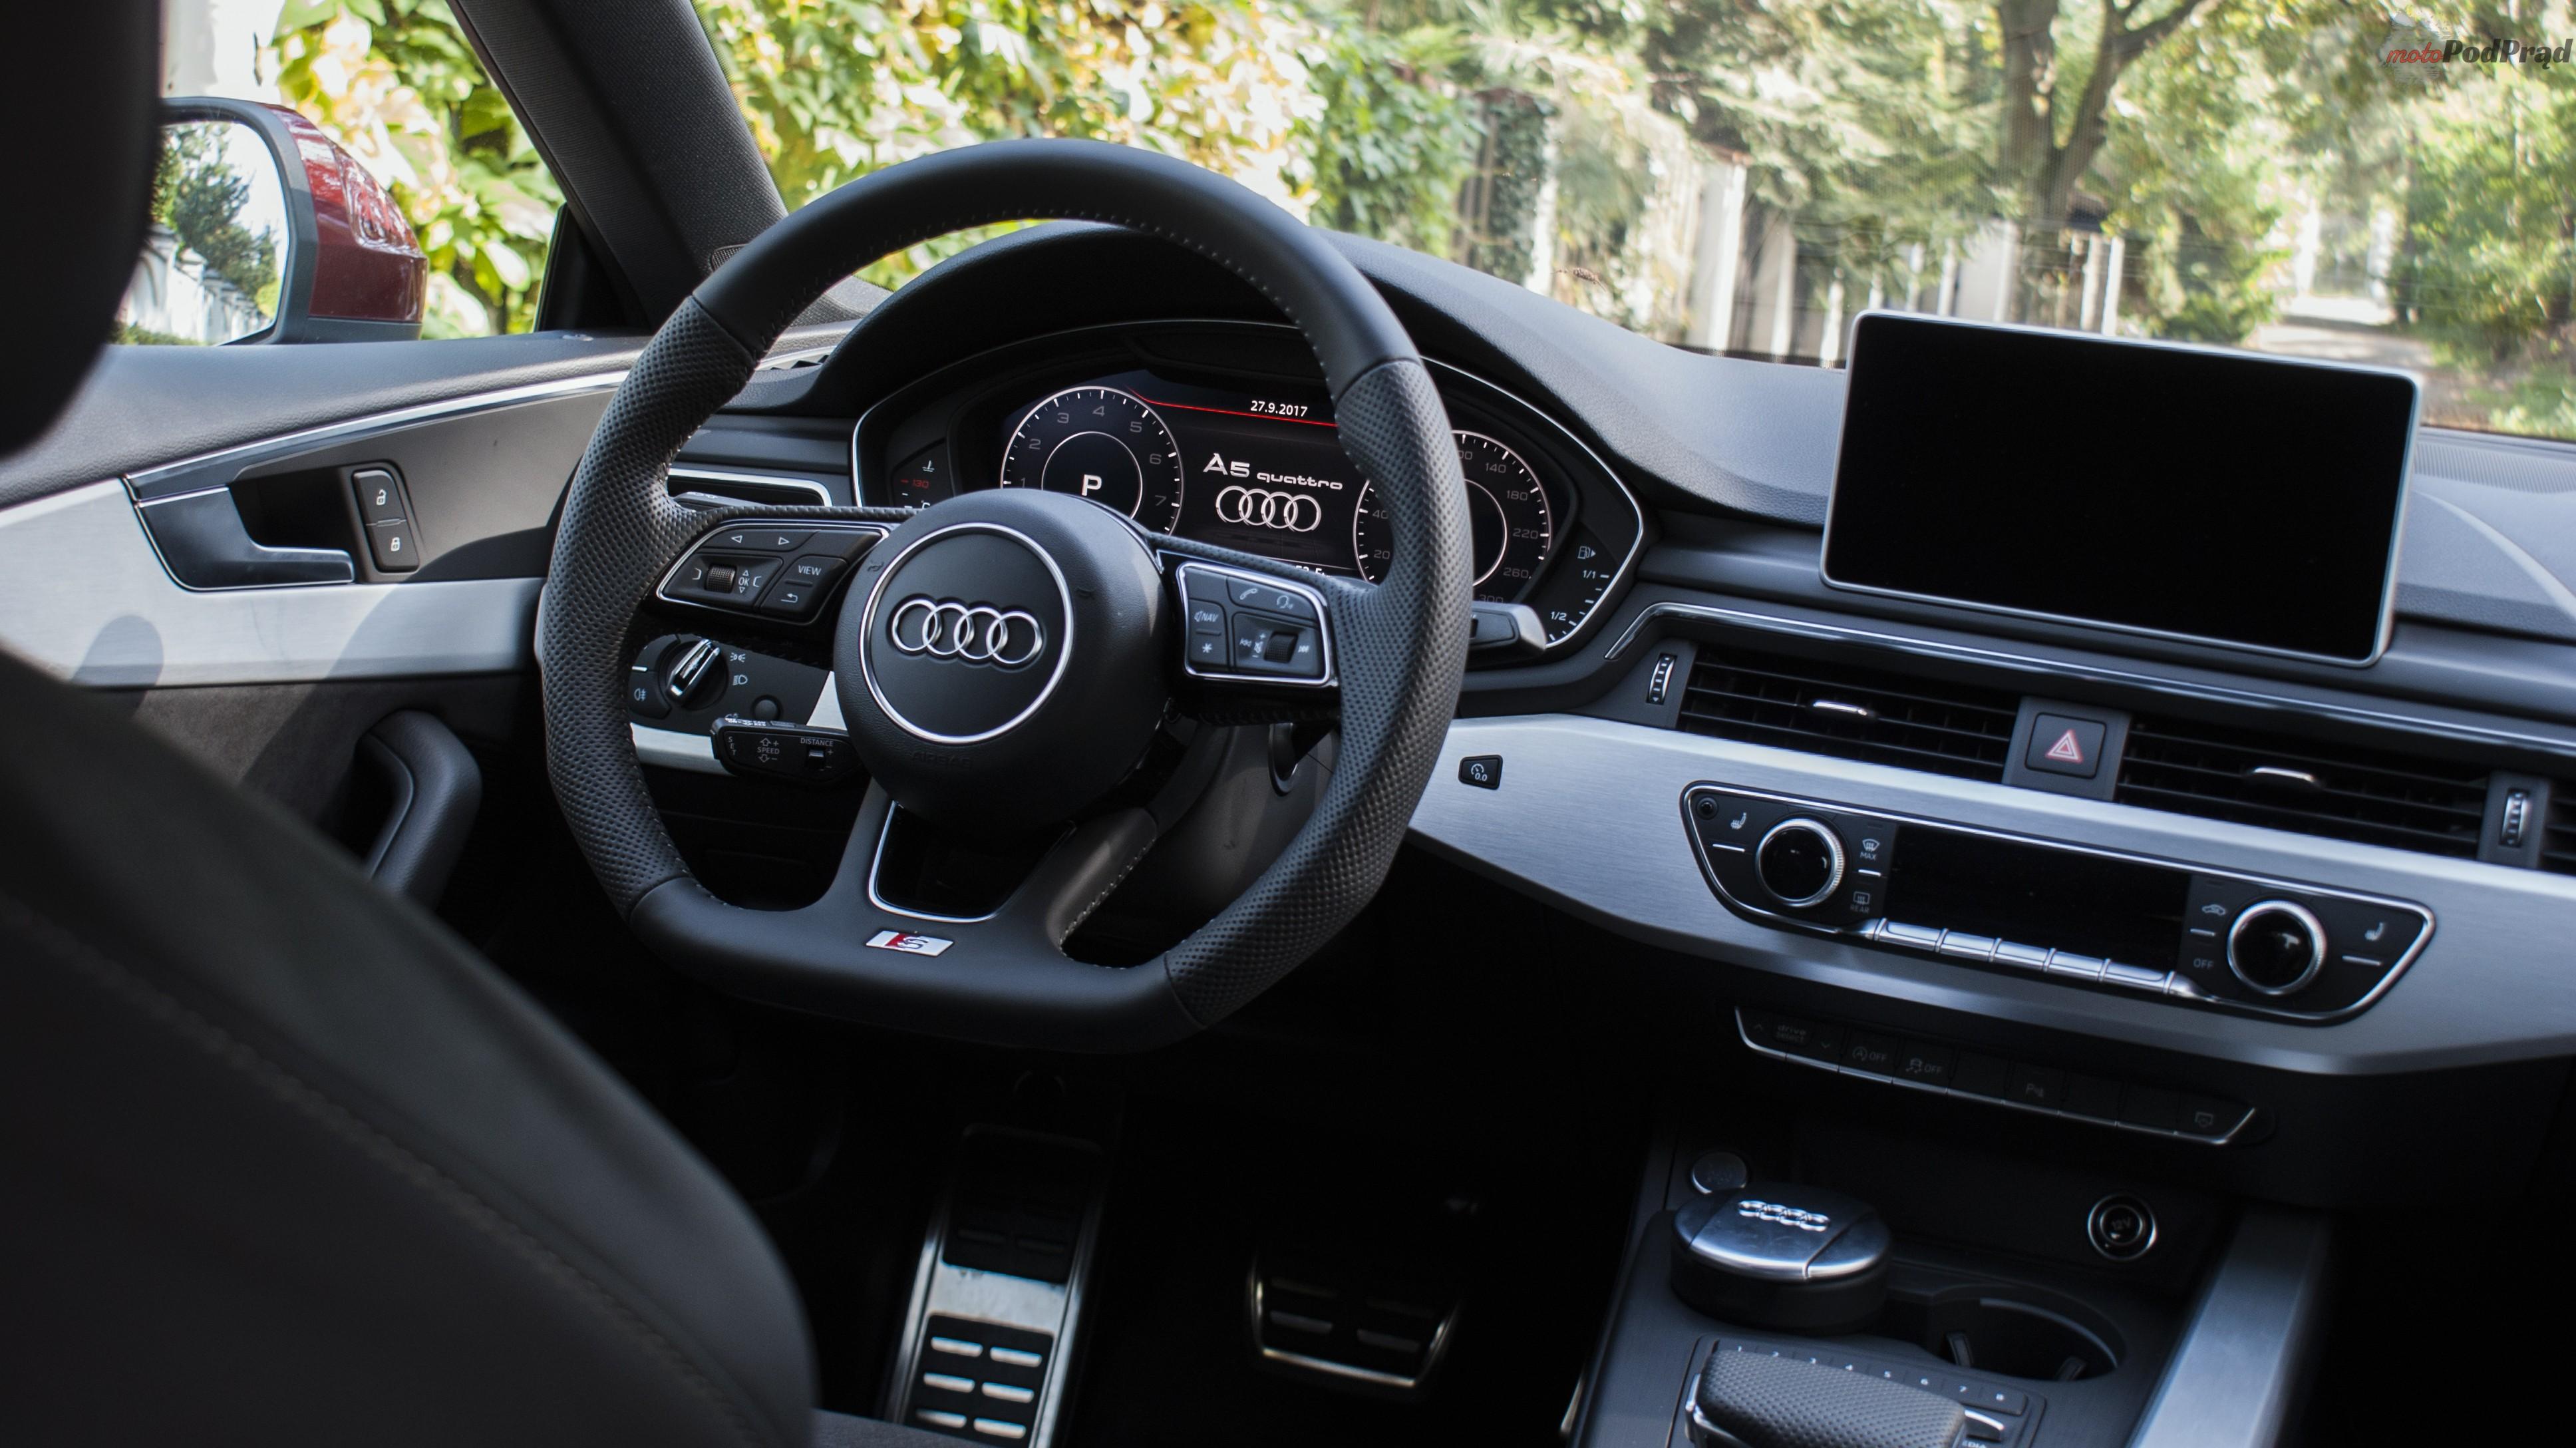 DSC01872 Minitest: Audi A5 Sportback 2.0 TFSI Quattro   Kwestia opakowania.